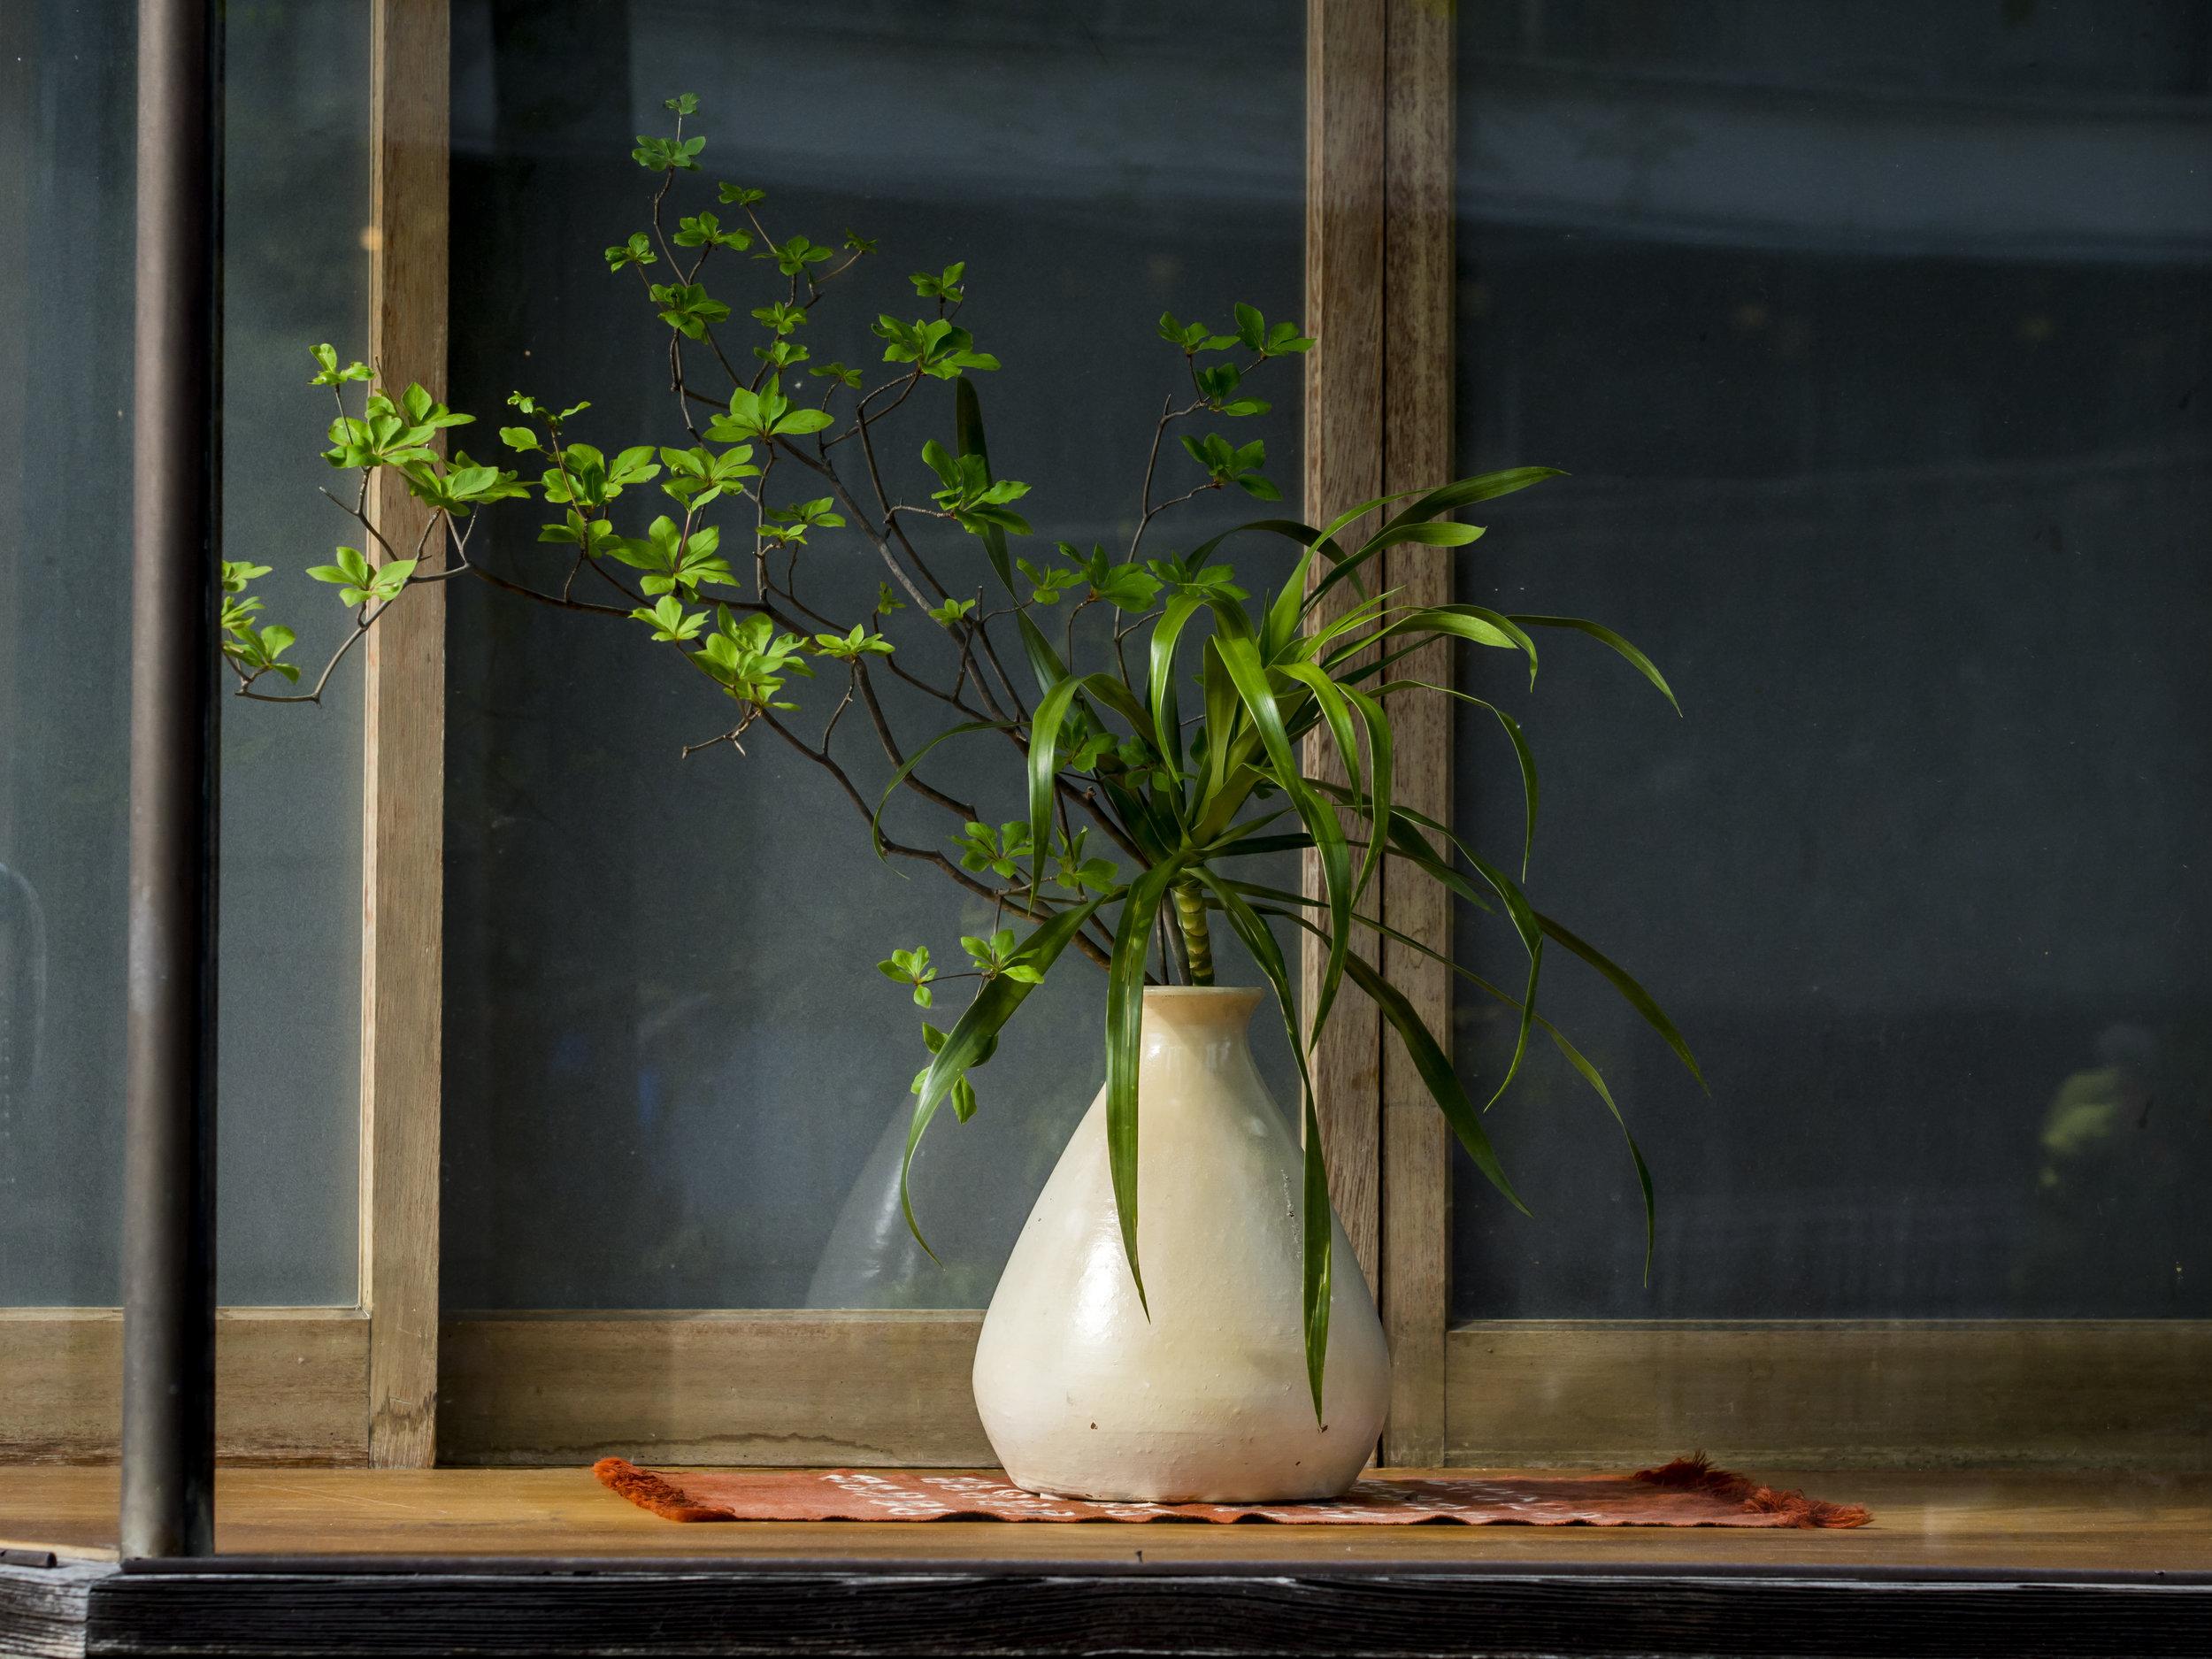 Kyoto shop window. EM5 45mm f5.6